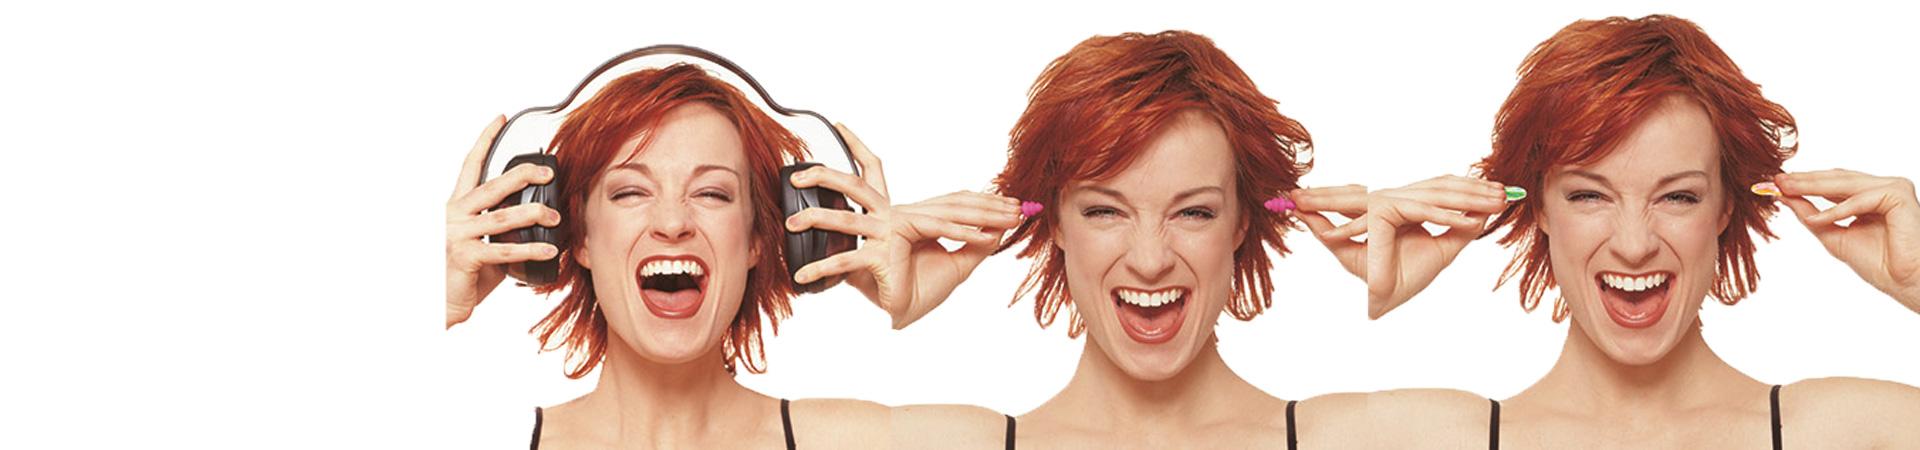 Lärmschutz , Moldex Gehörschutzprogramm